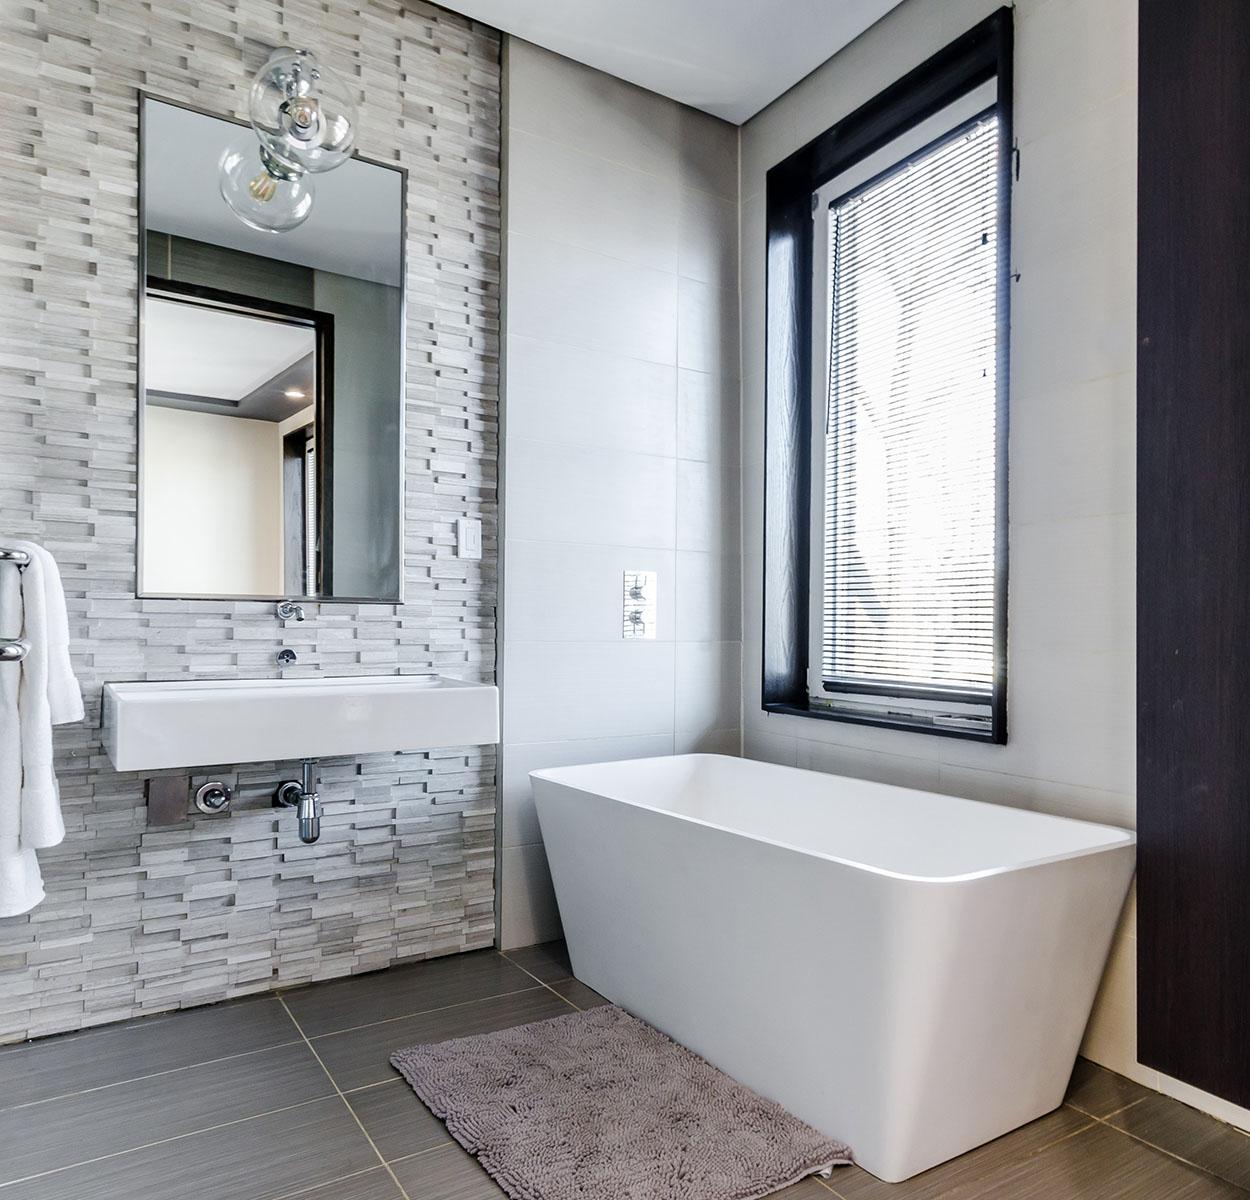 badeværelse VVS Installatør Aalborg